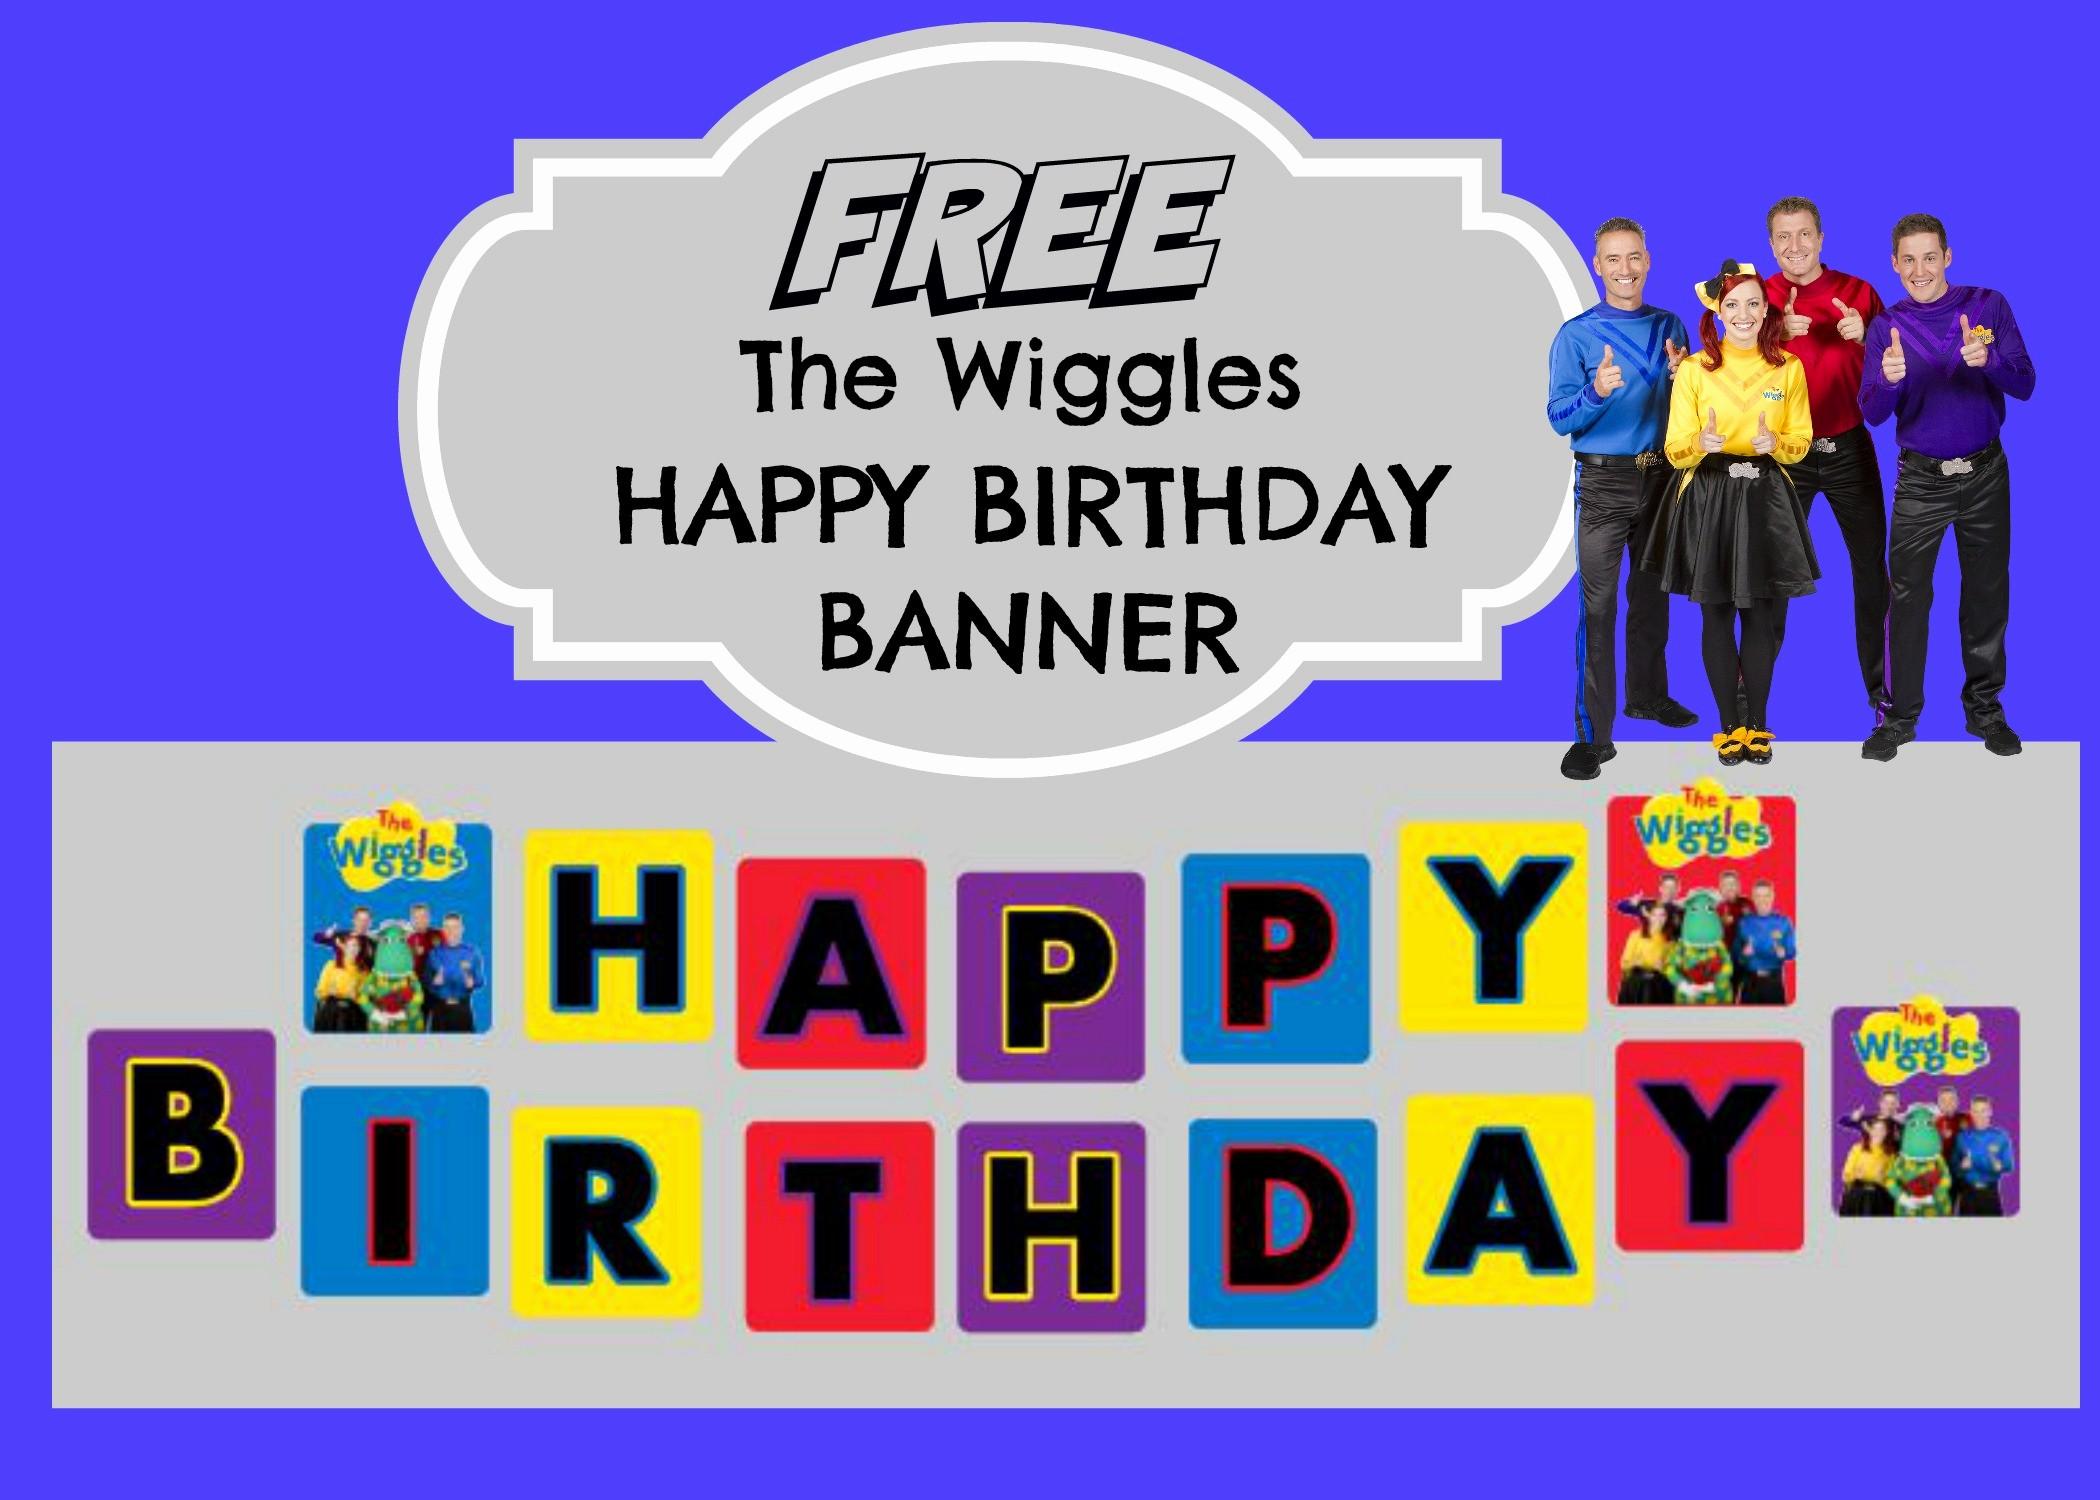 Birthday Banner Maker Online Free Elegant the Wiggles Happy Birthday Banner